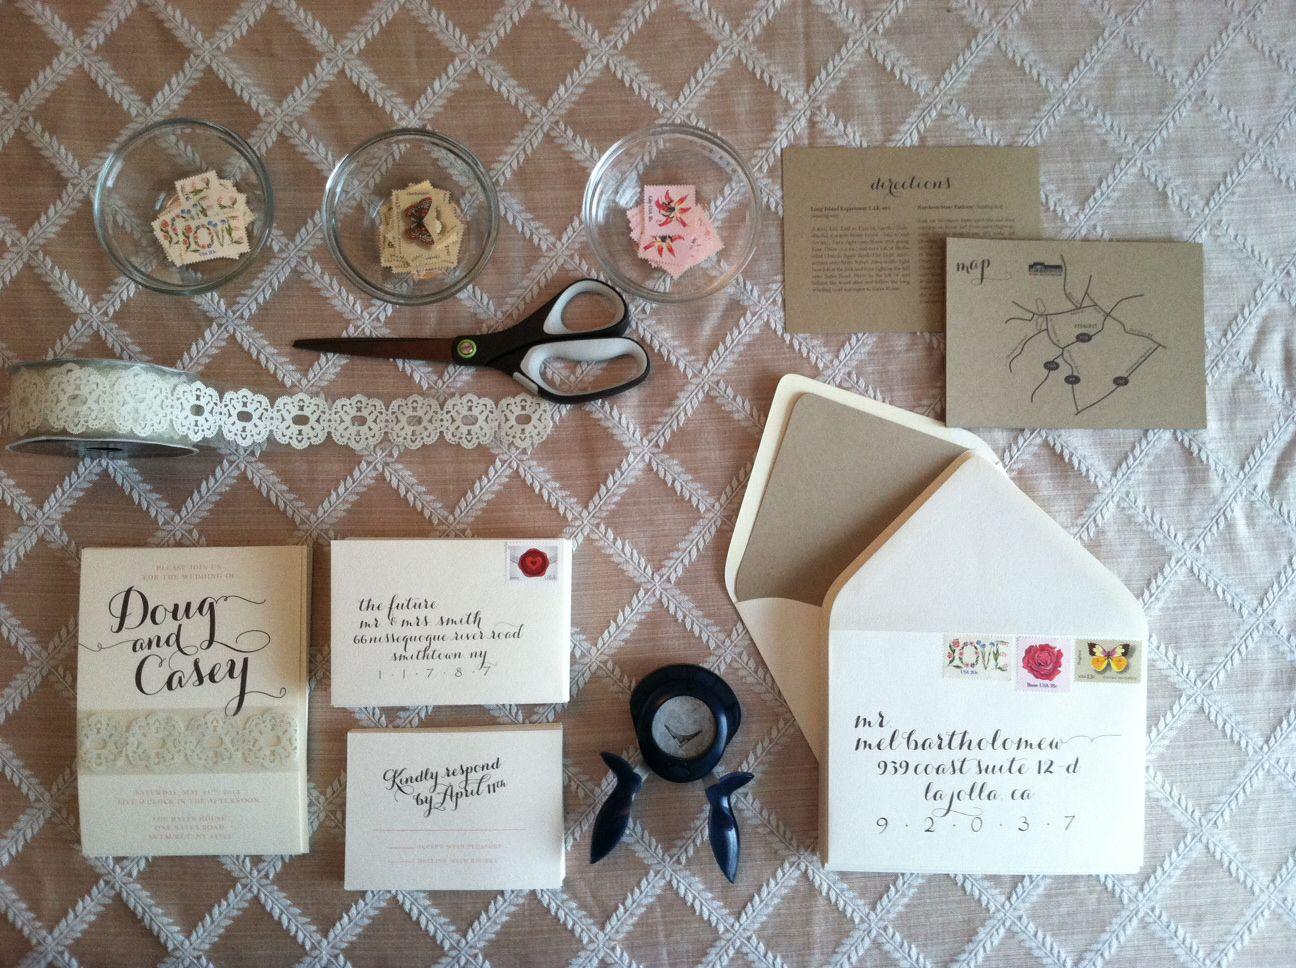 Superieur Rustic Diy Wedding | Diy Rustic Wedding Invitations Diy Rustic Wedding  Invitation